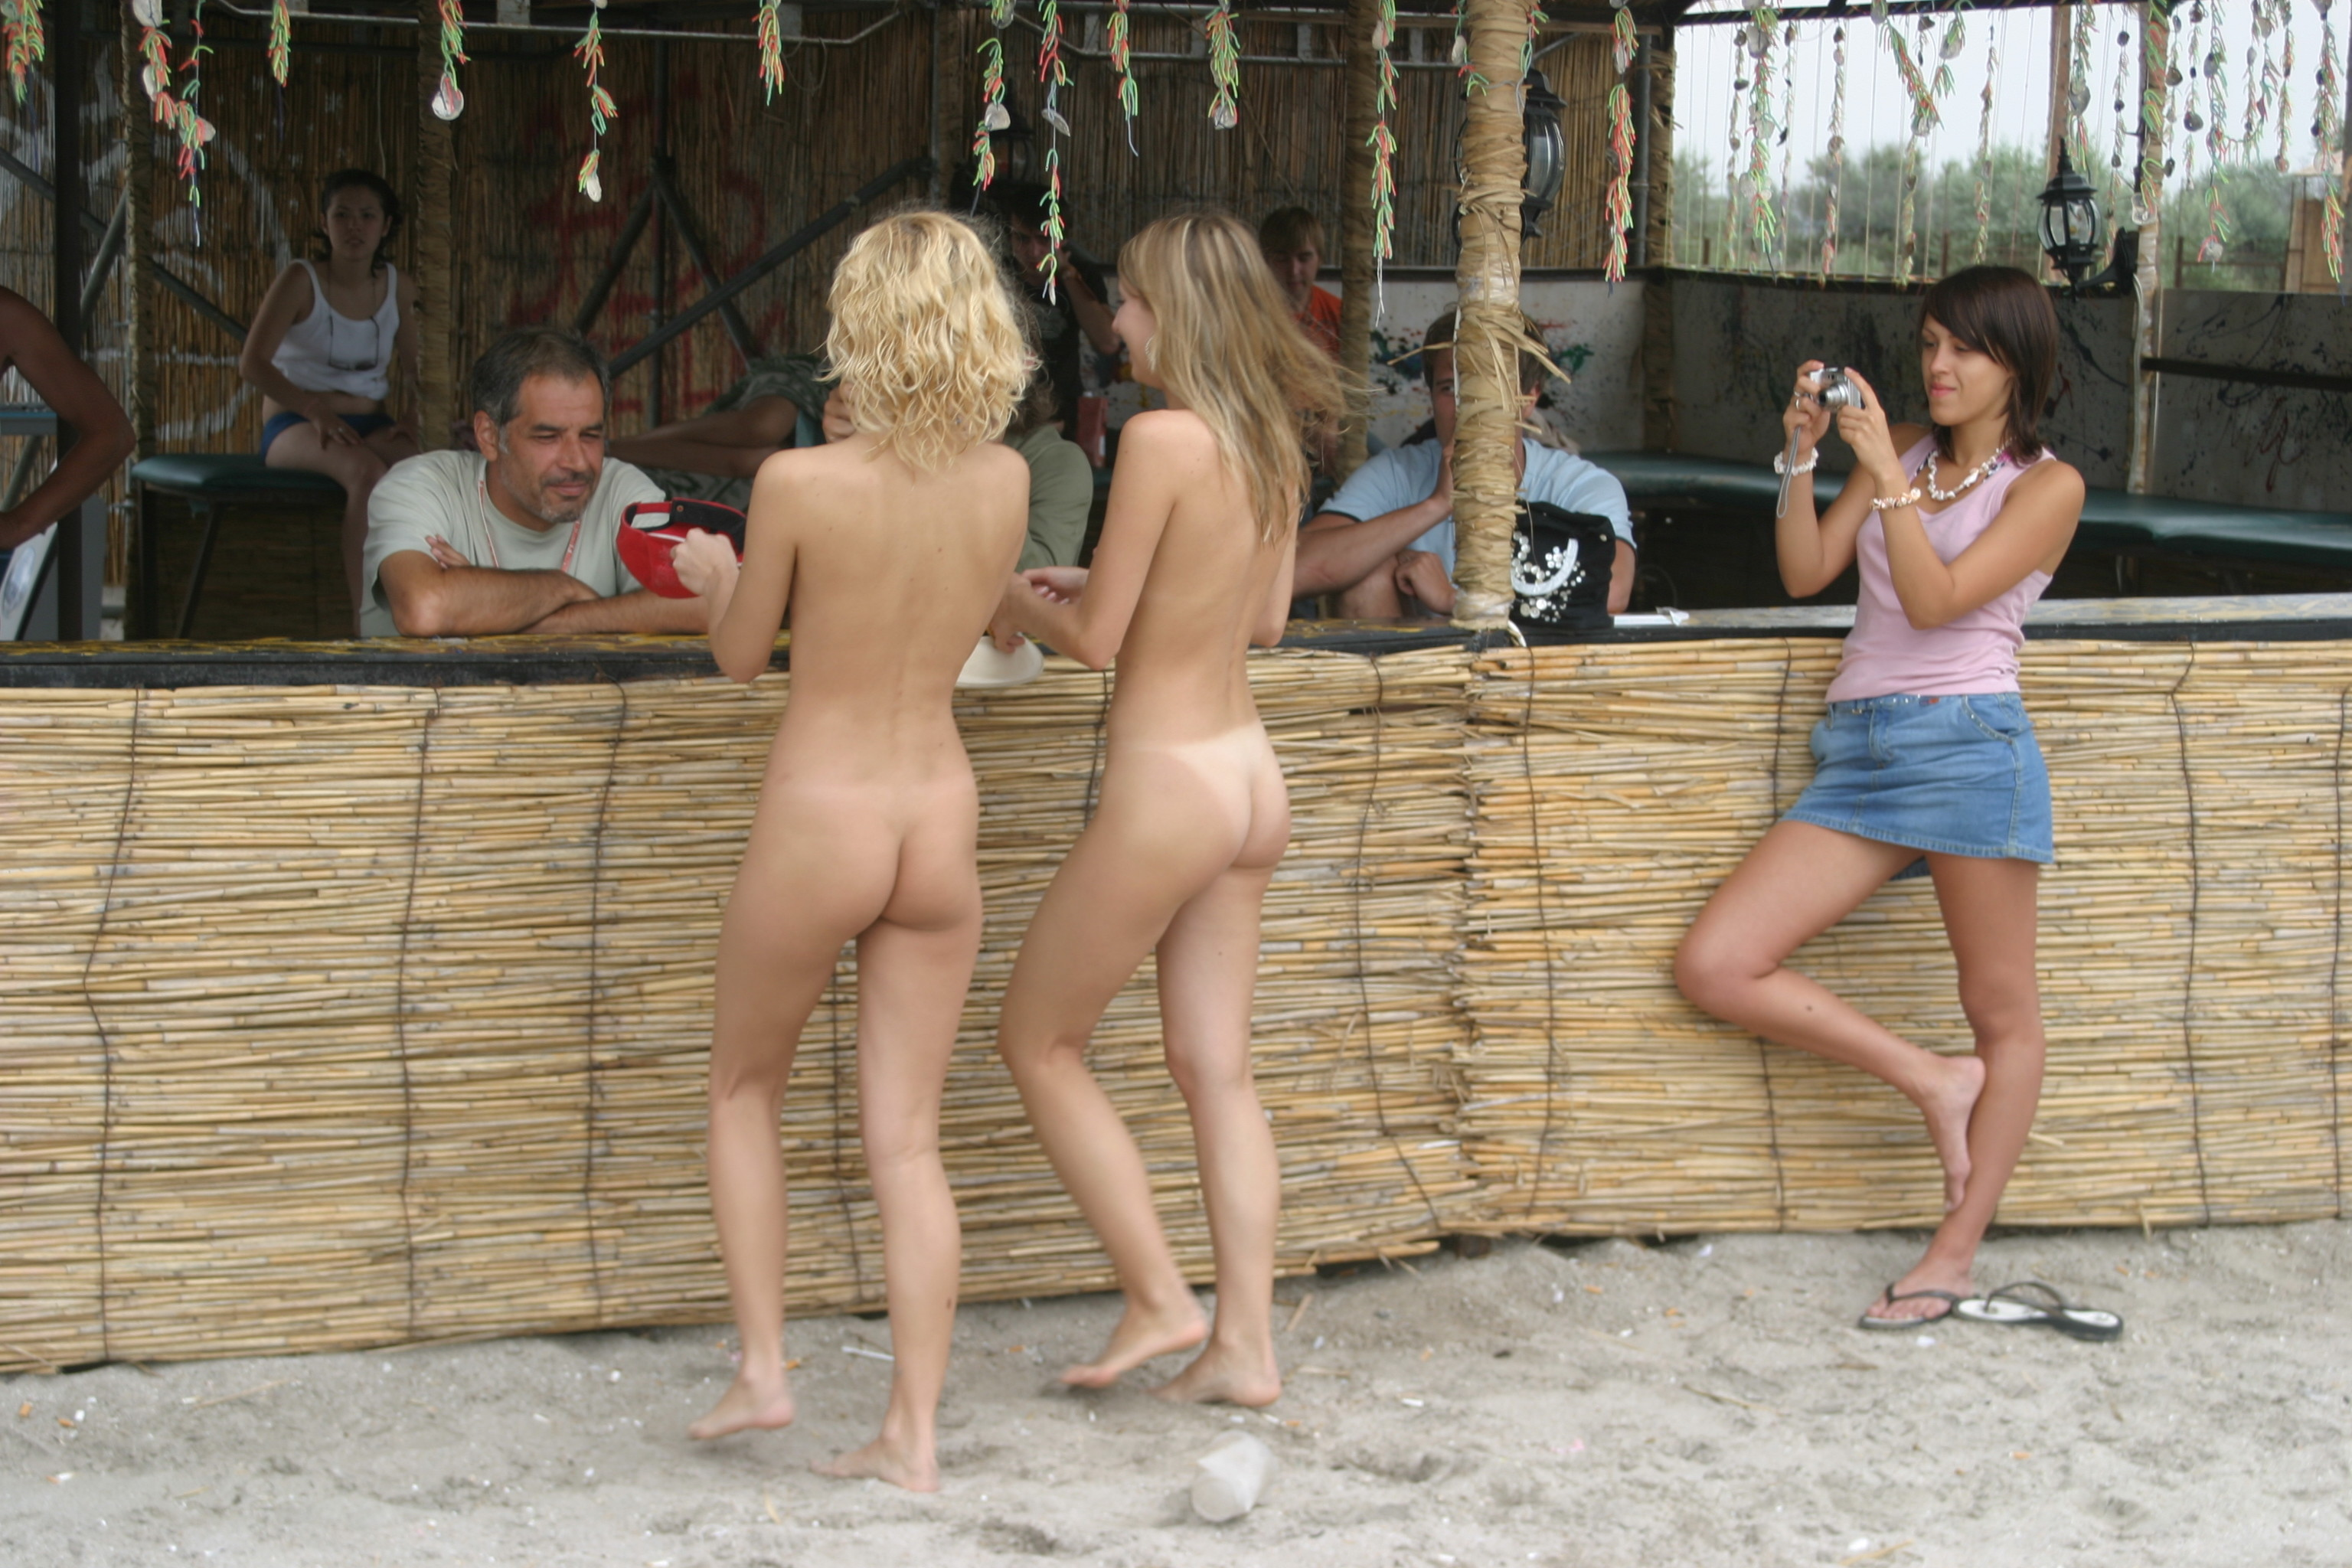 vika-y-lena-l-beach-nude-in-public-metart-34